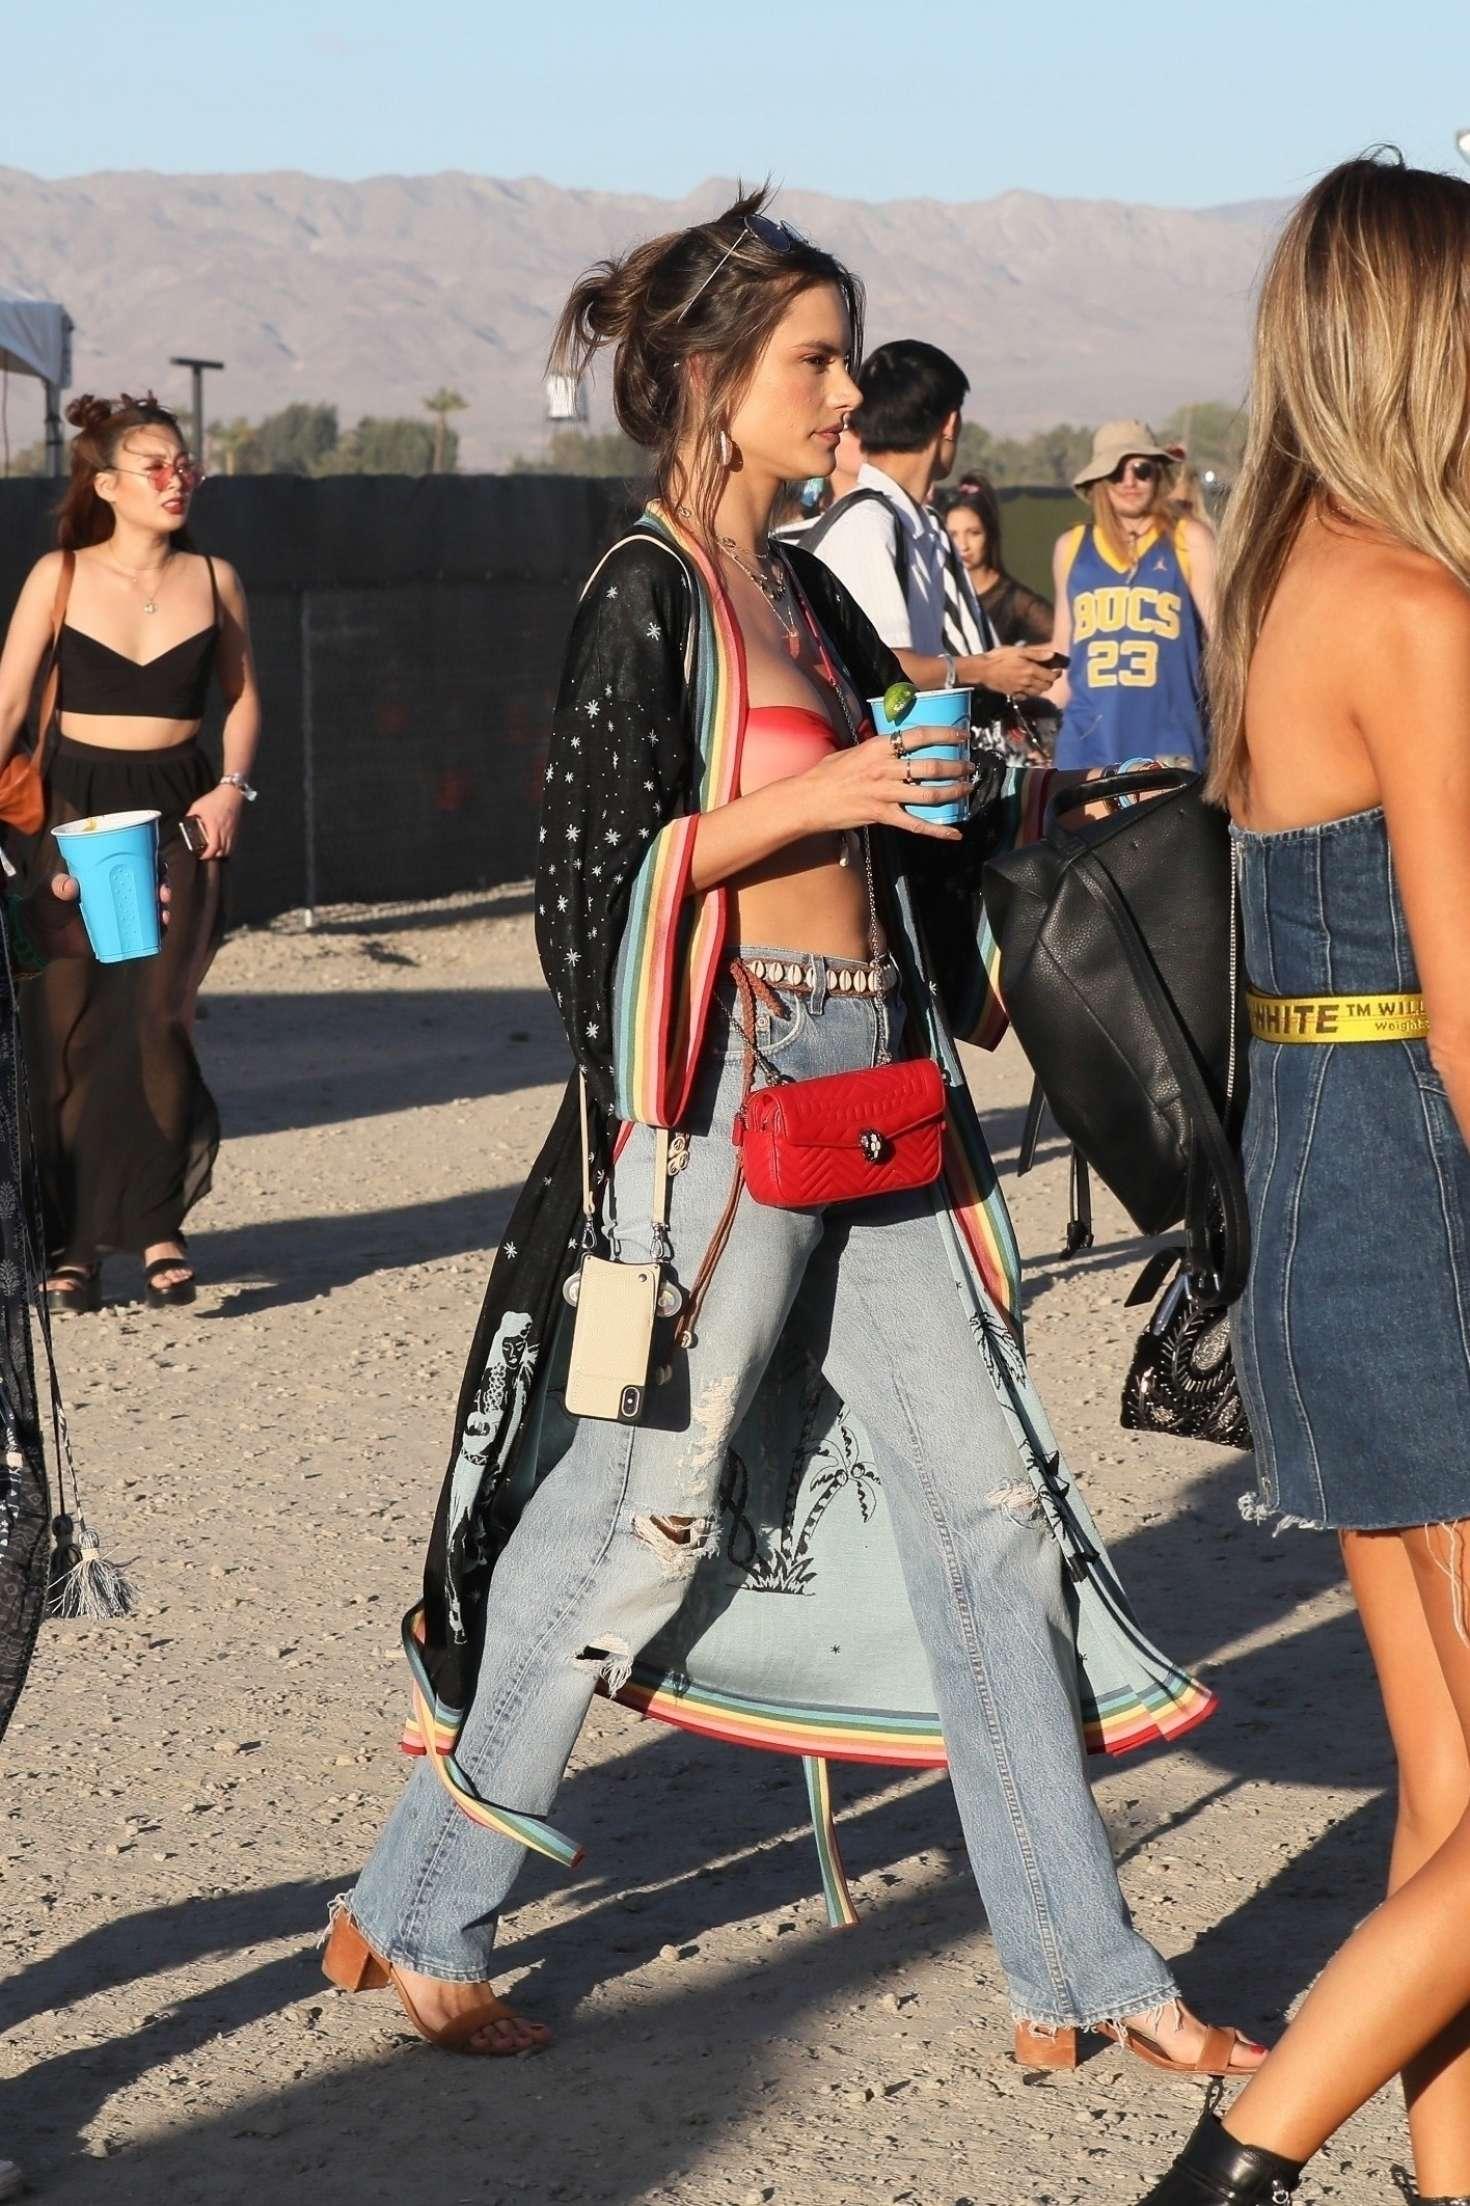 Alessandra Ambrosio at Coachella Valley Music and Arts Festival in Indio